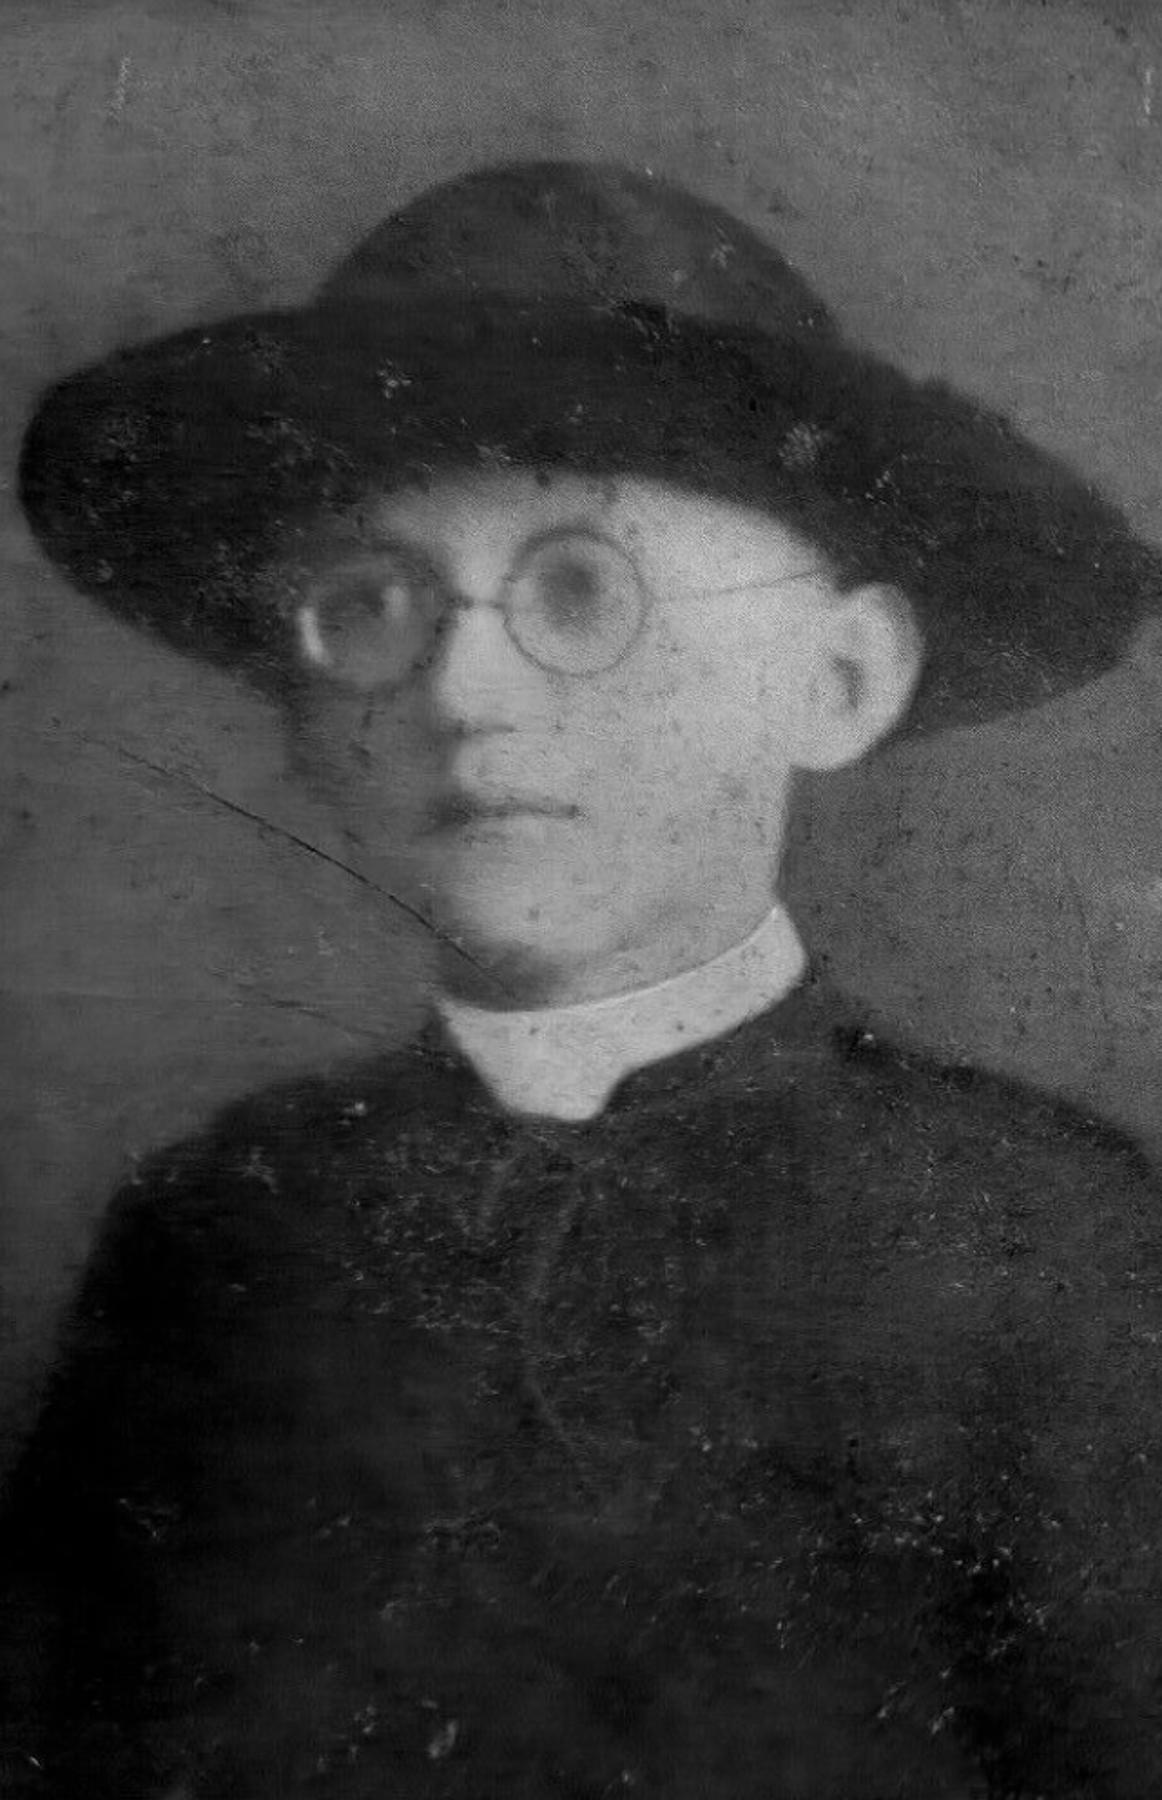 Fichier:Pasquale Canzii (1914-1930).jpg — Wikipédia